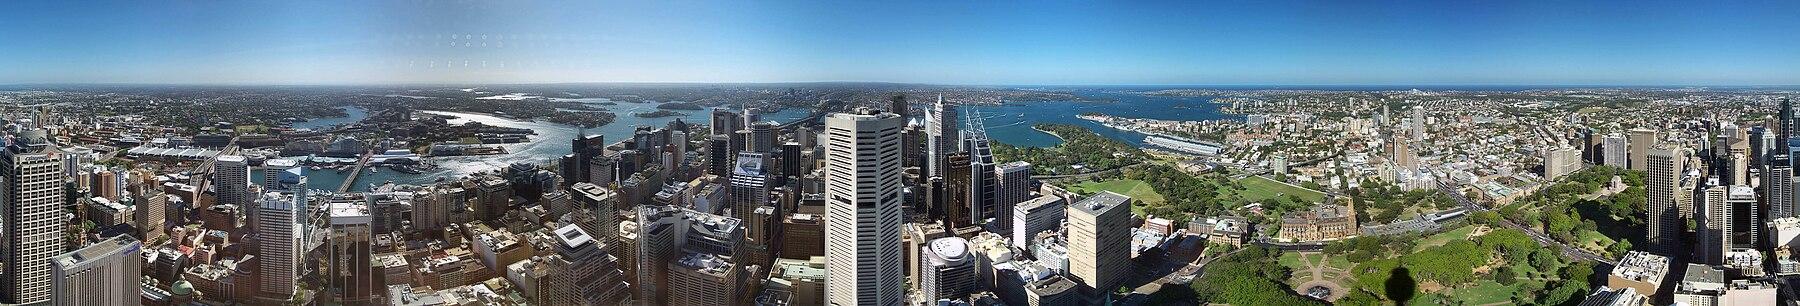 Панорама из Сиднейской телебашни